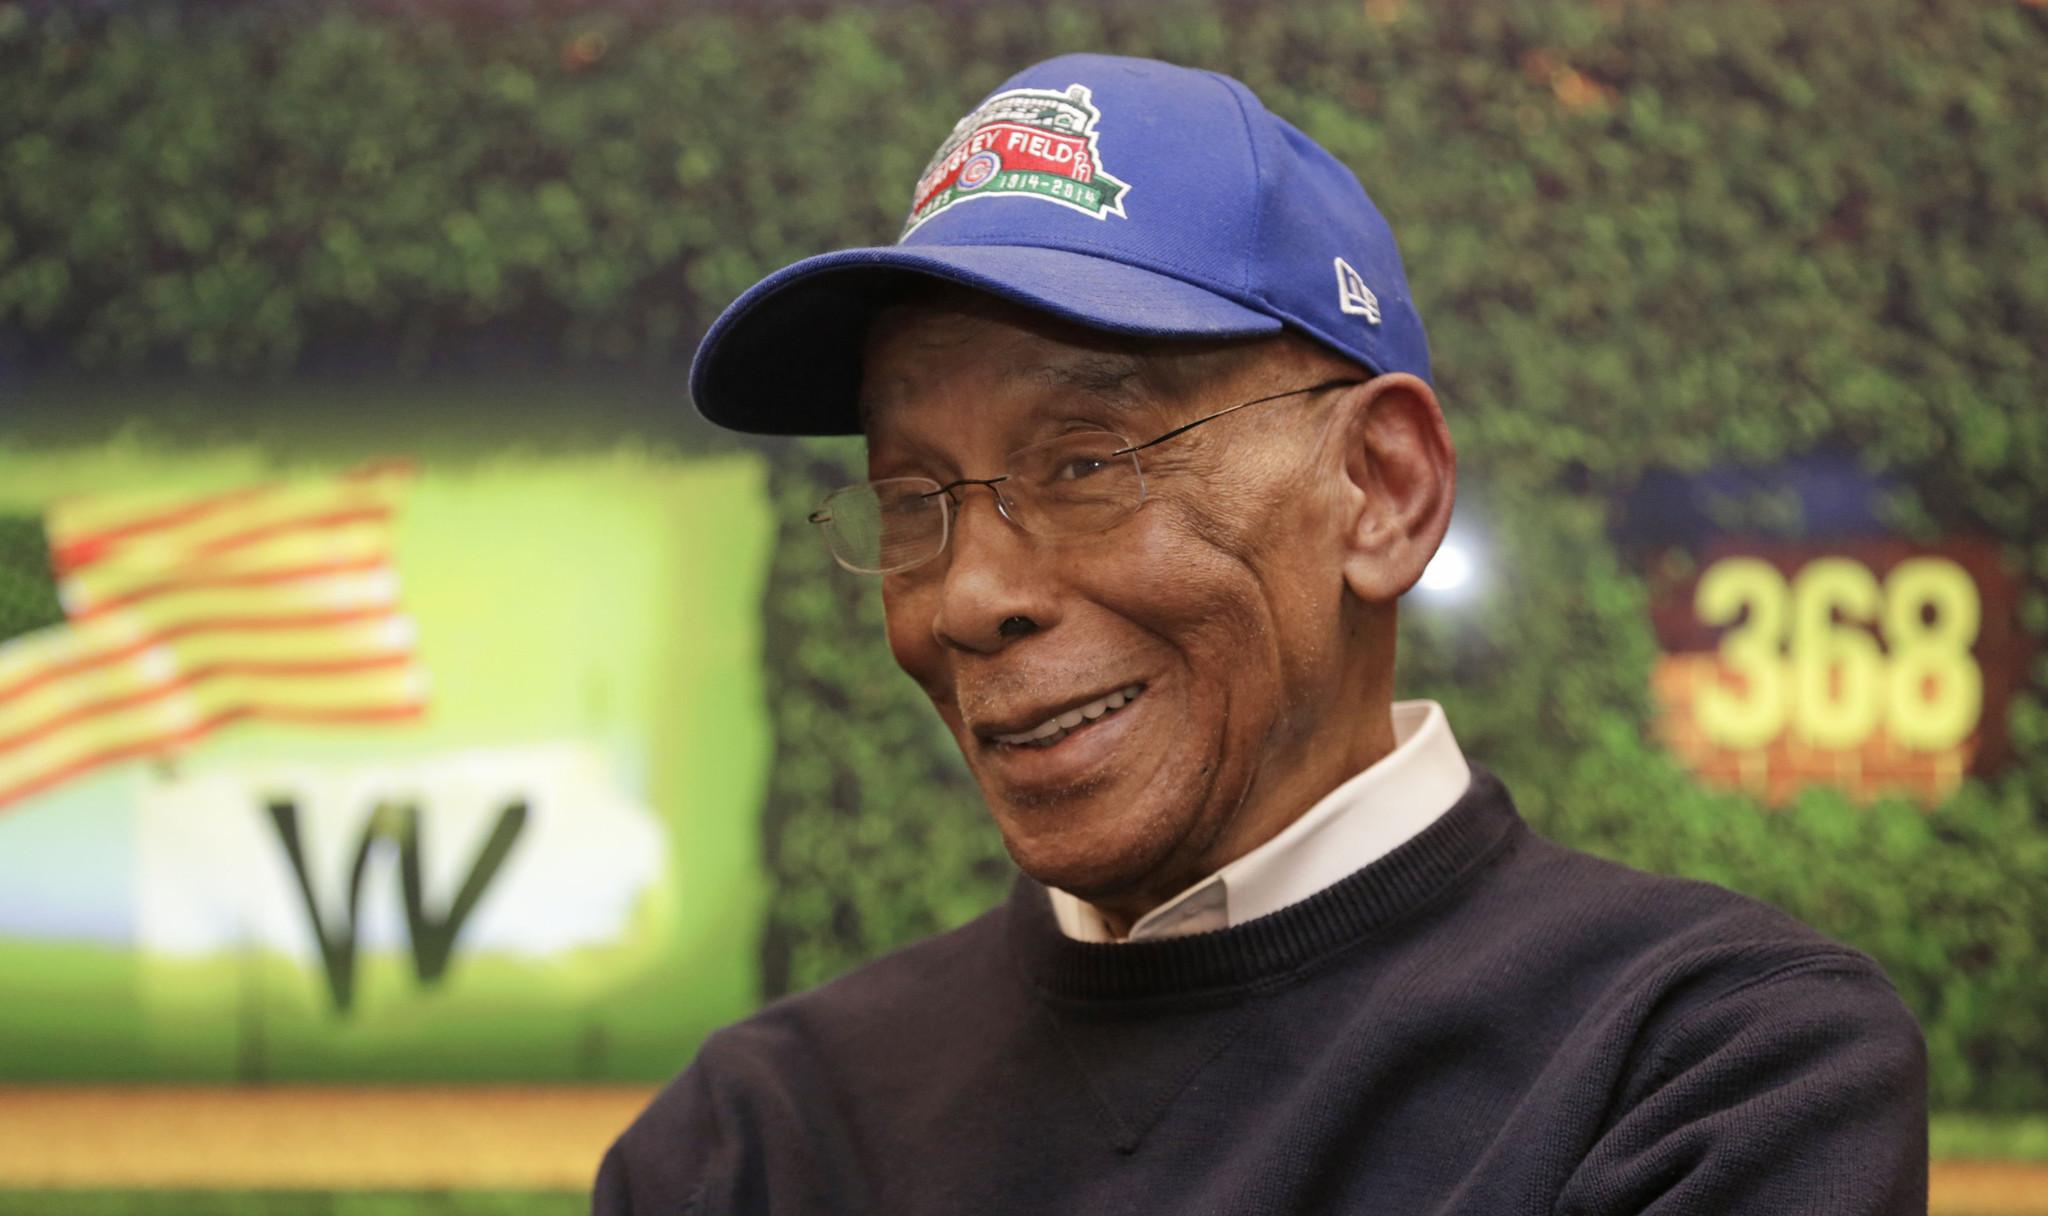 Ernie Banks, legendary Cubs player, dead at 83